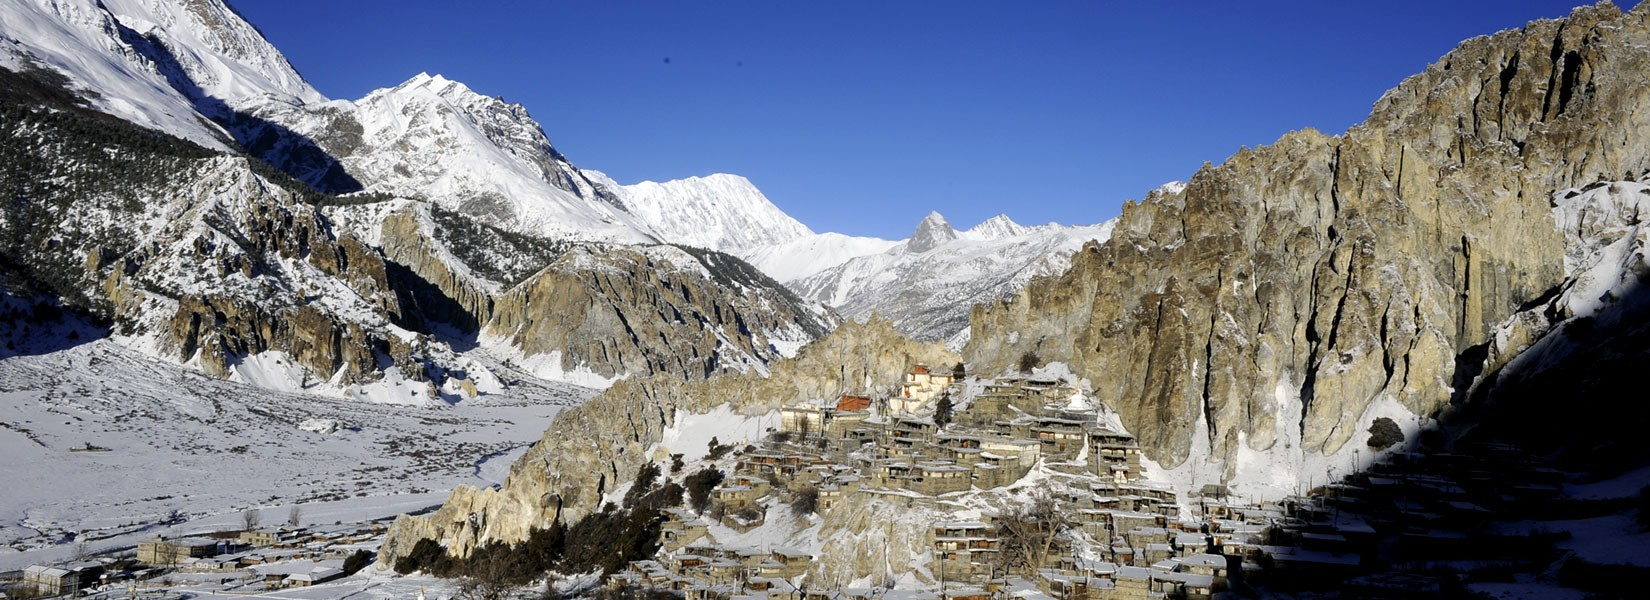 Annapurna Classic Trek Thorang La Pass